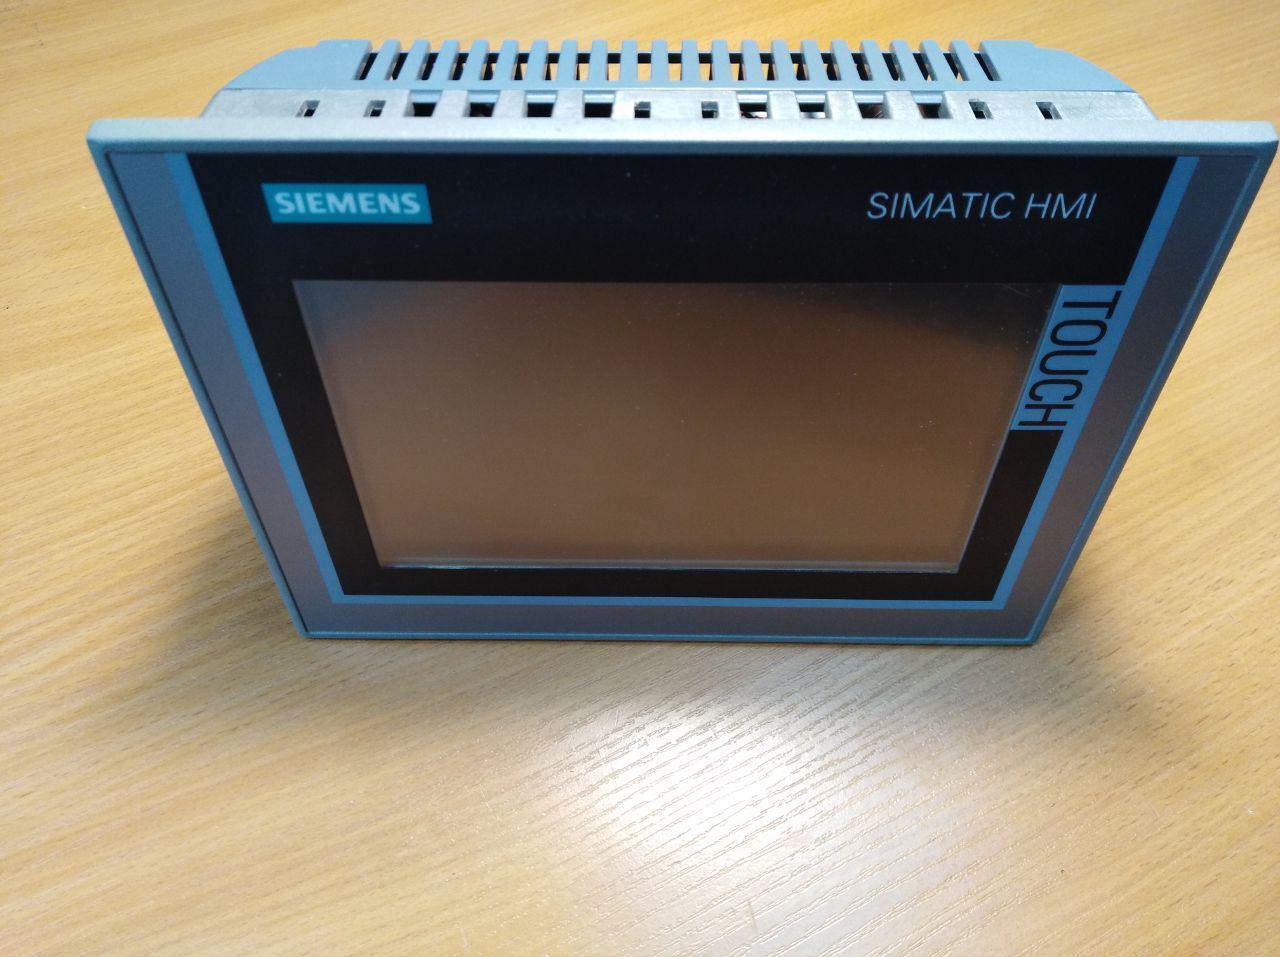 OPERATOR PANEL SIMATIC HMI 6AV2124-0GC01-0AX0